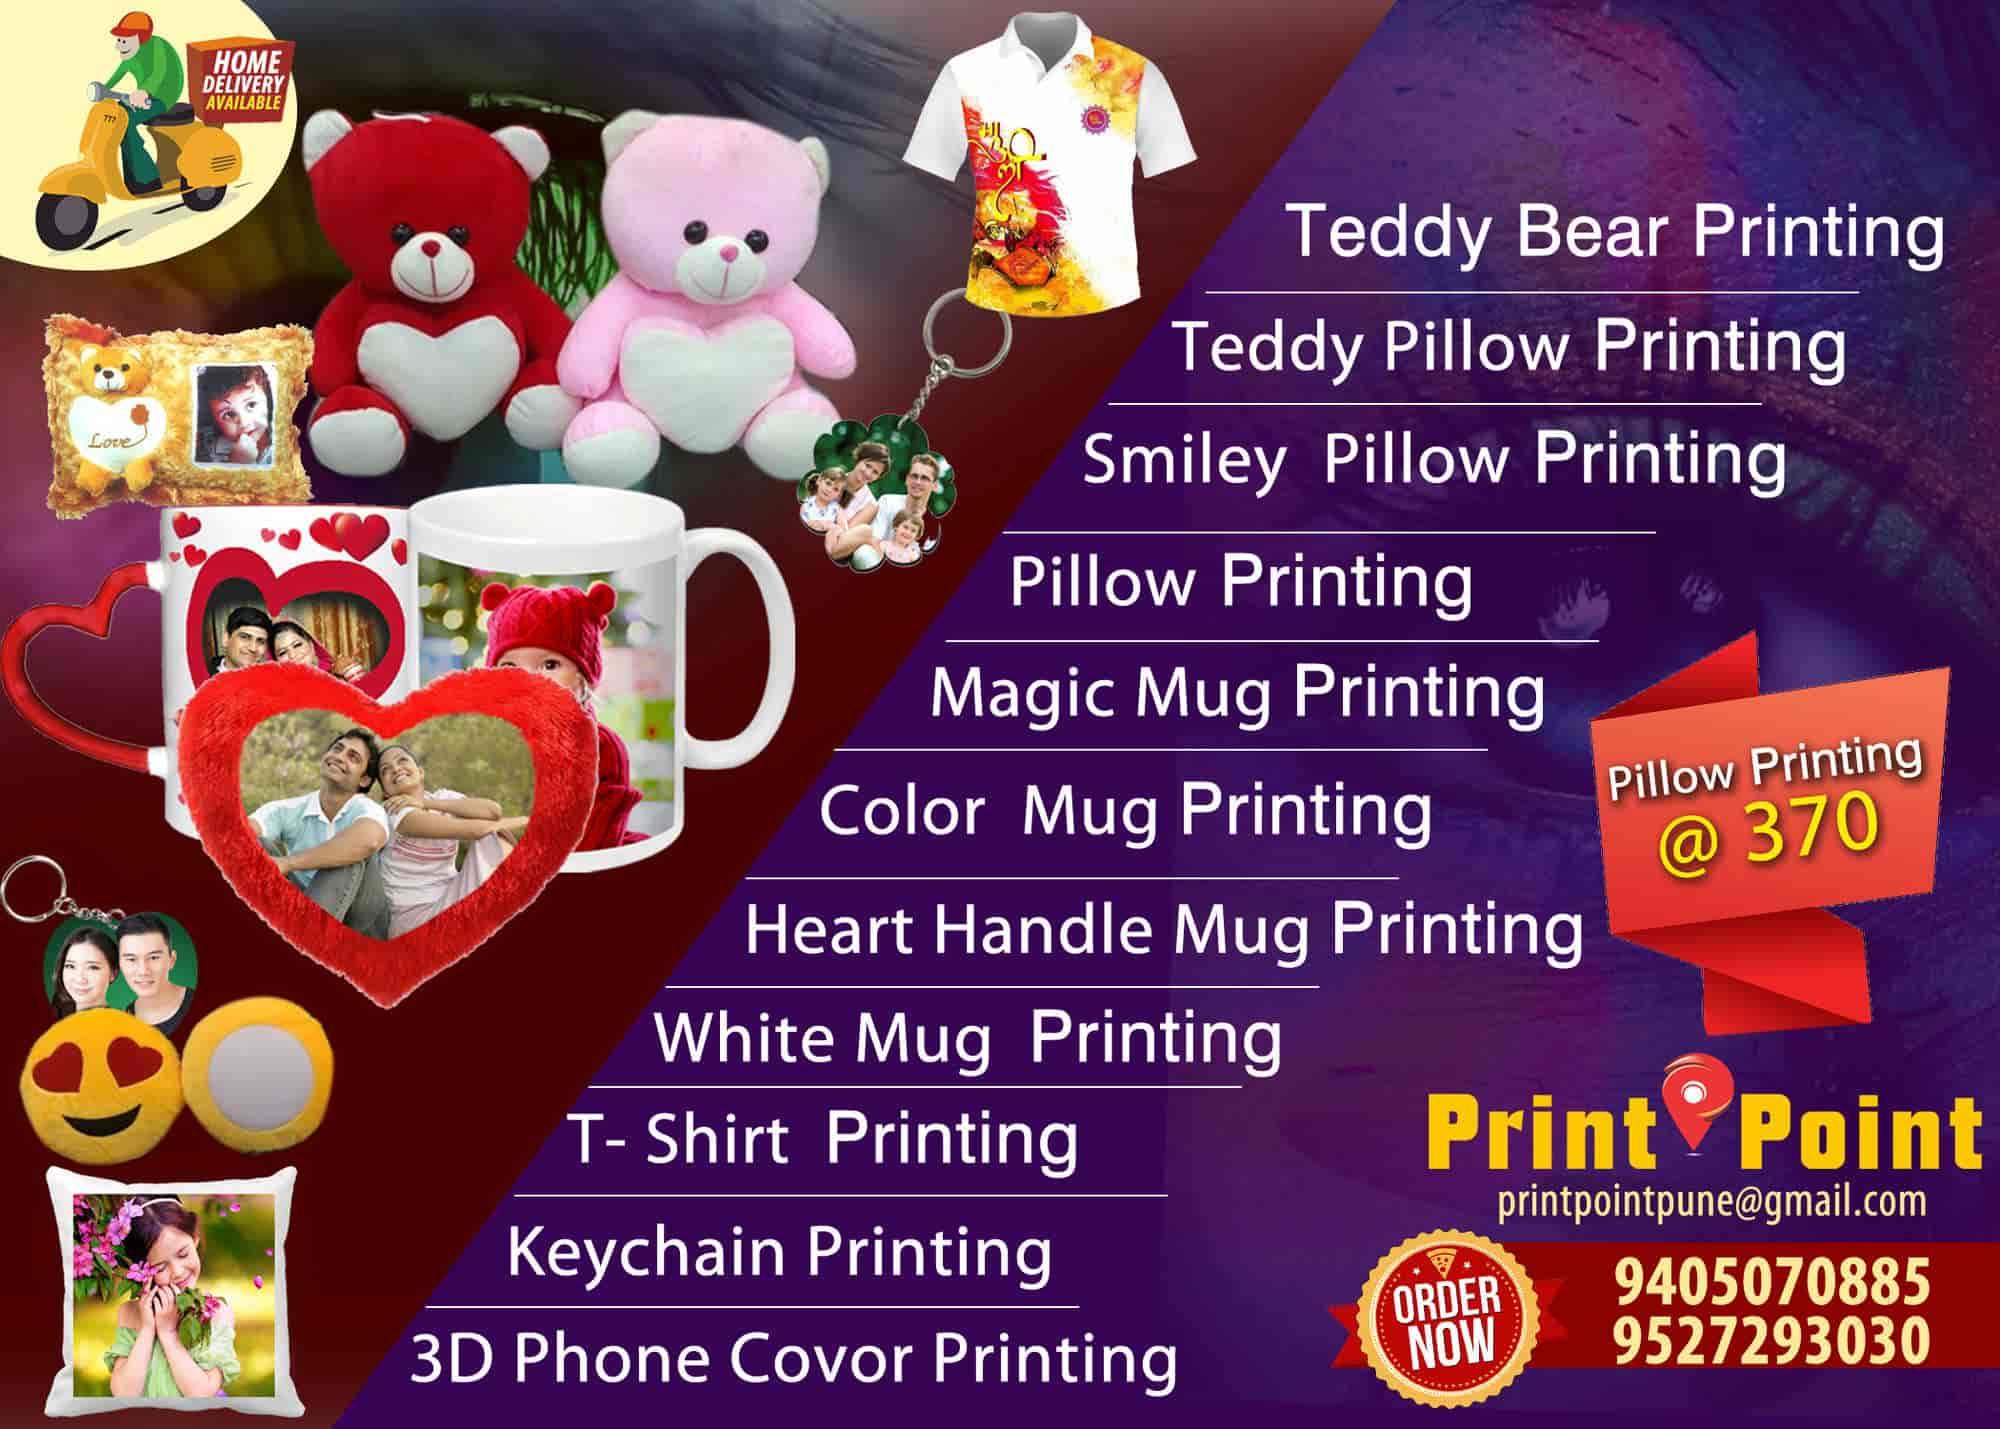 Print Point Chikhali Flex Printing